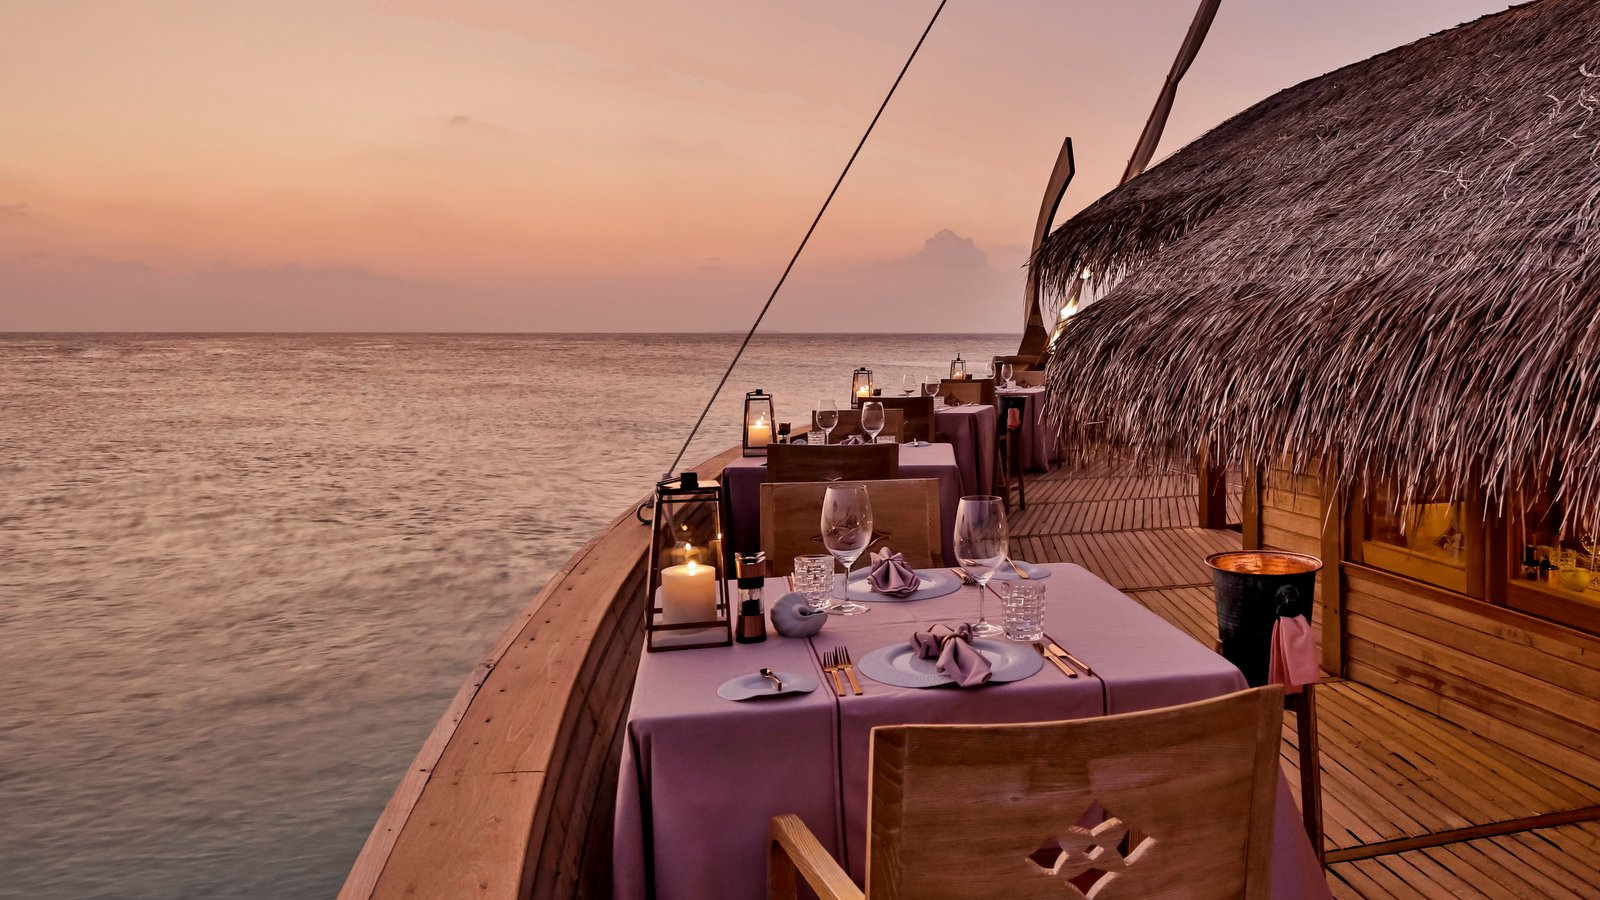 Мальдивы, отель Milaidhoo Island Maldives, ресторан Ba'theli by the Reef